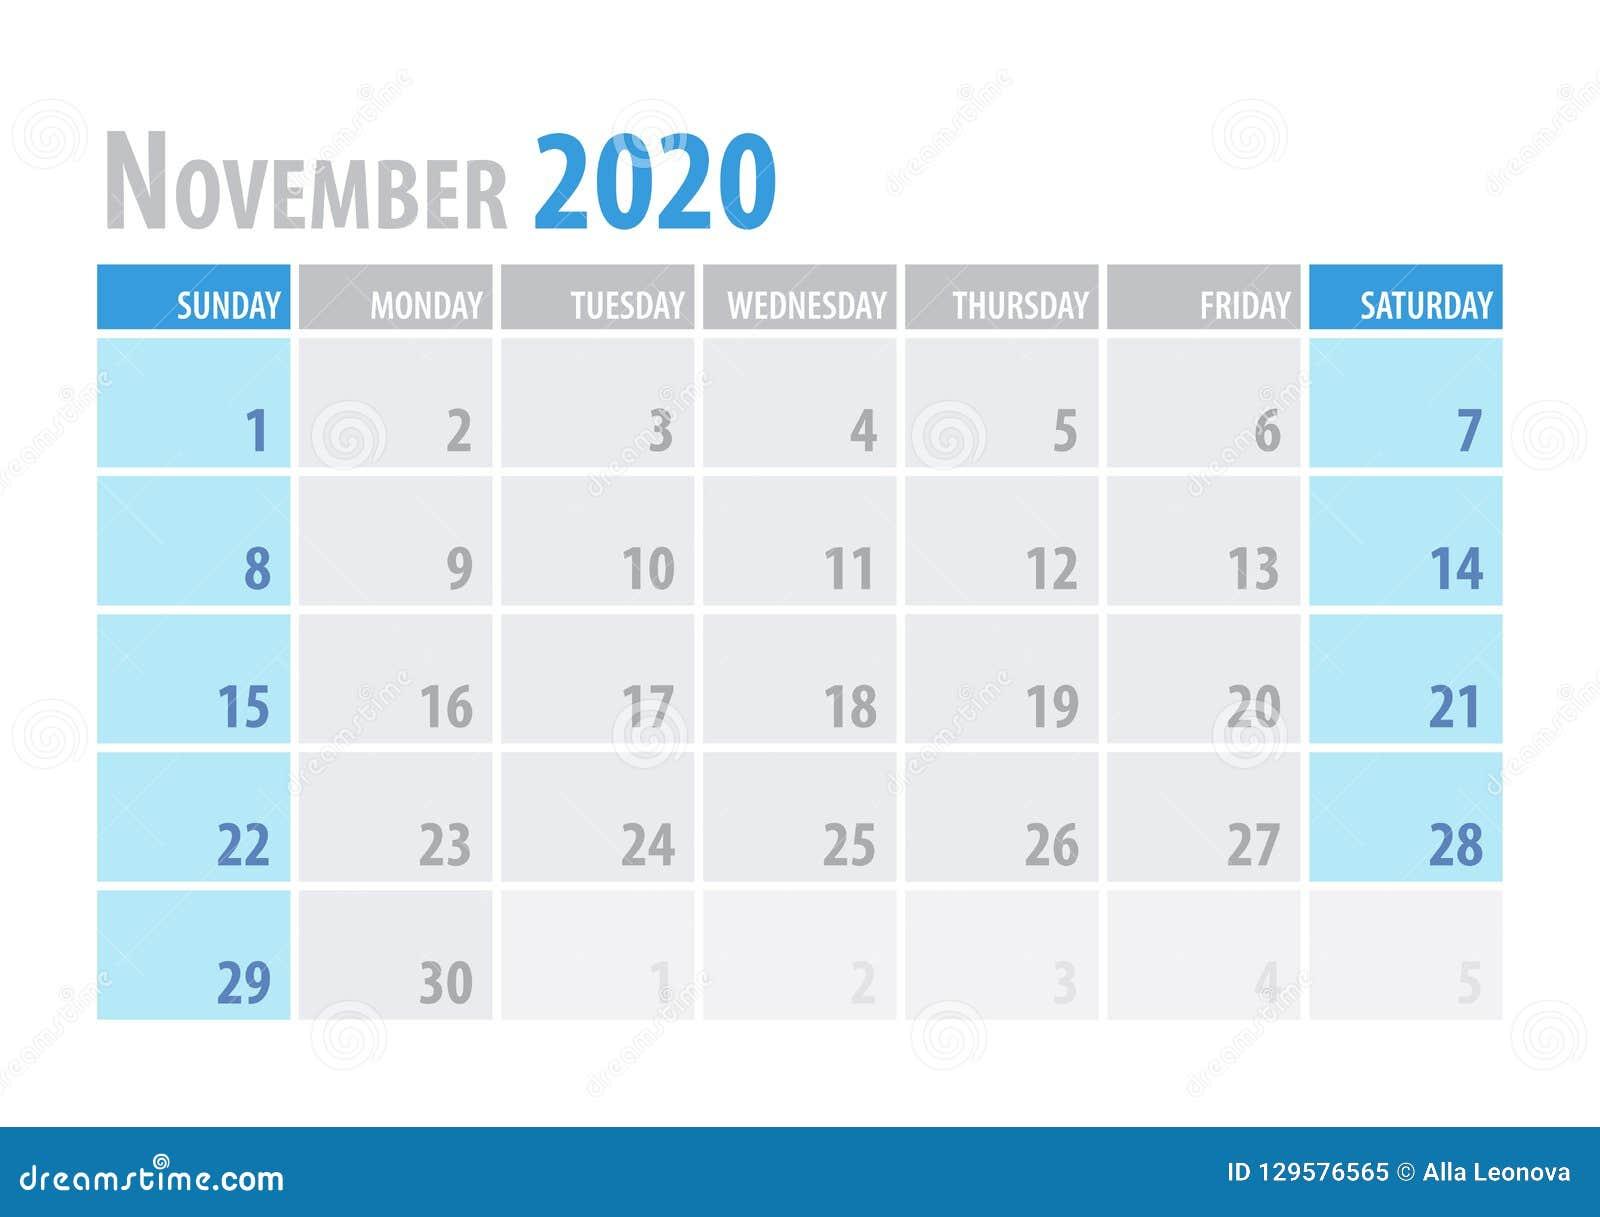 Calendario 2020 Planner.November Calendar Planner 2020 In Clean Minimal Table